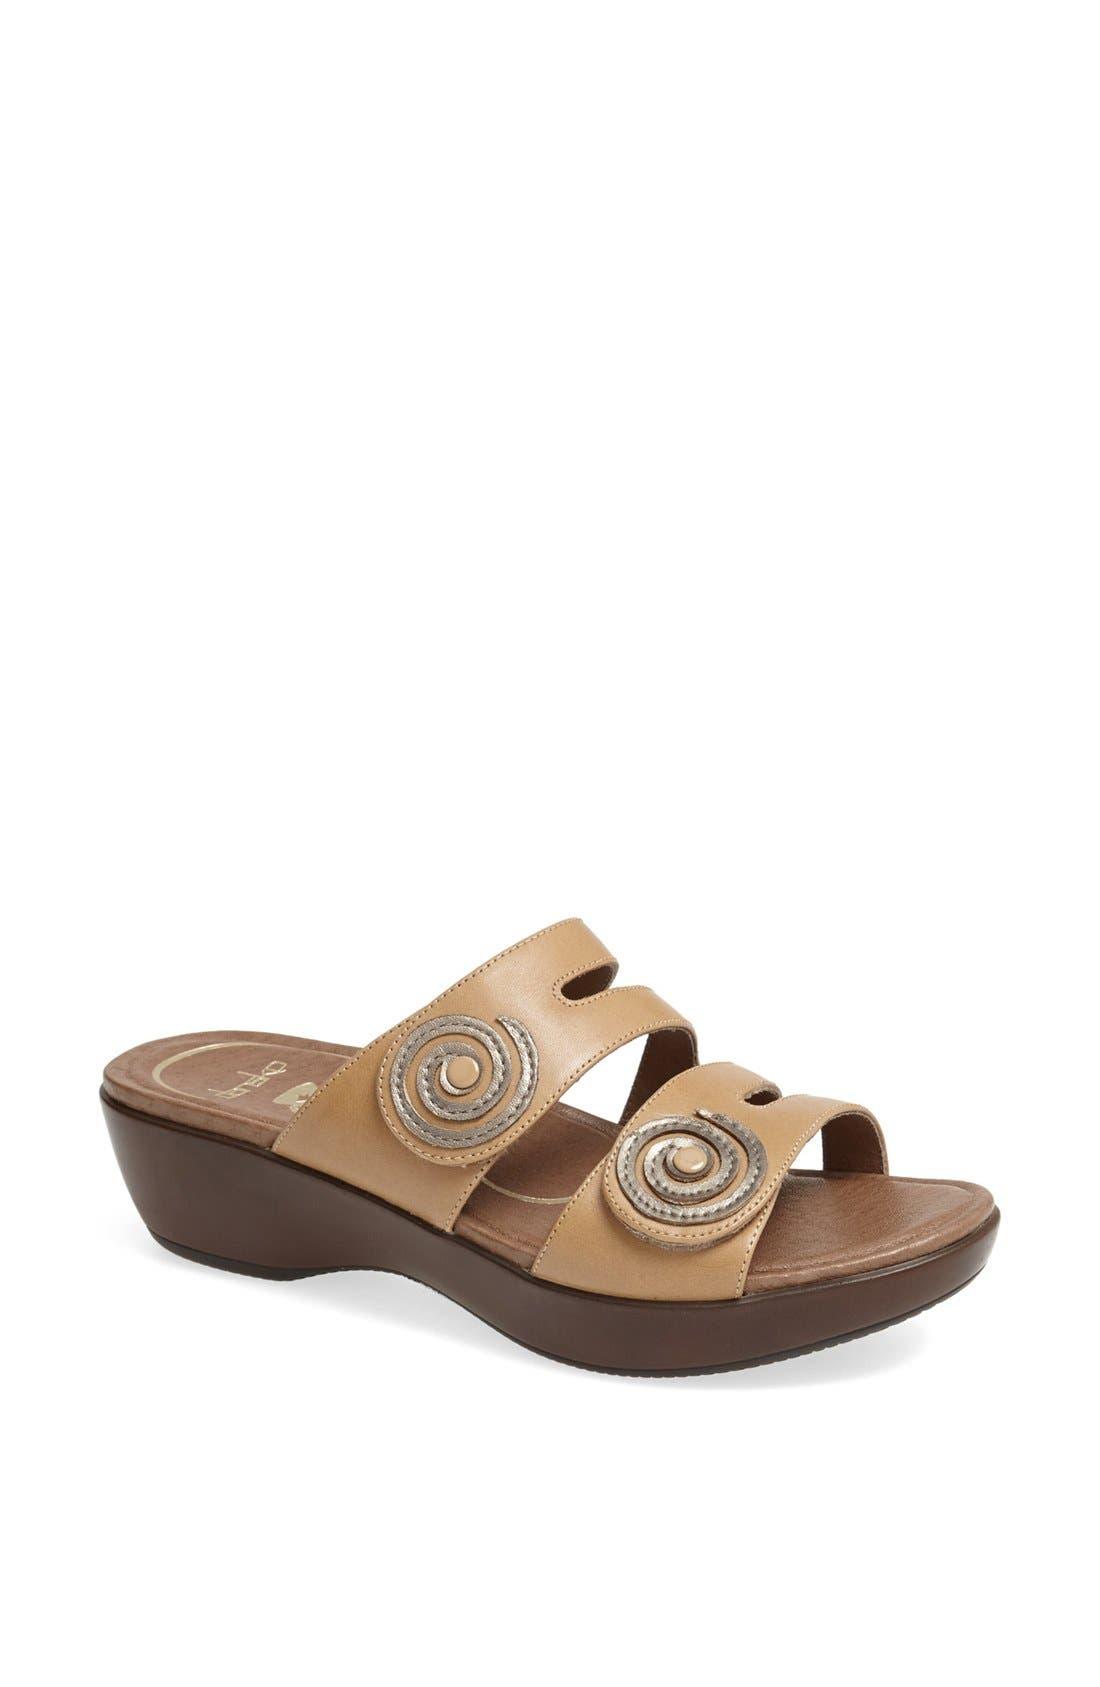 Main Image - Dansko 'Dixie' Sandal